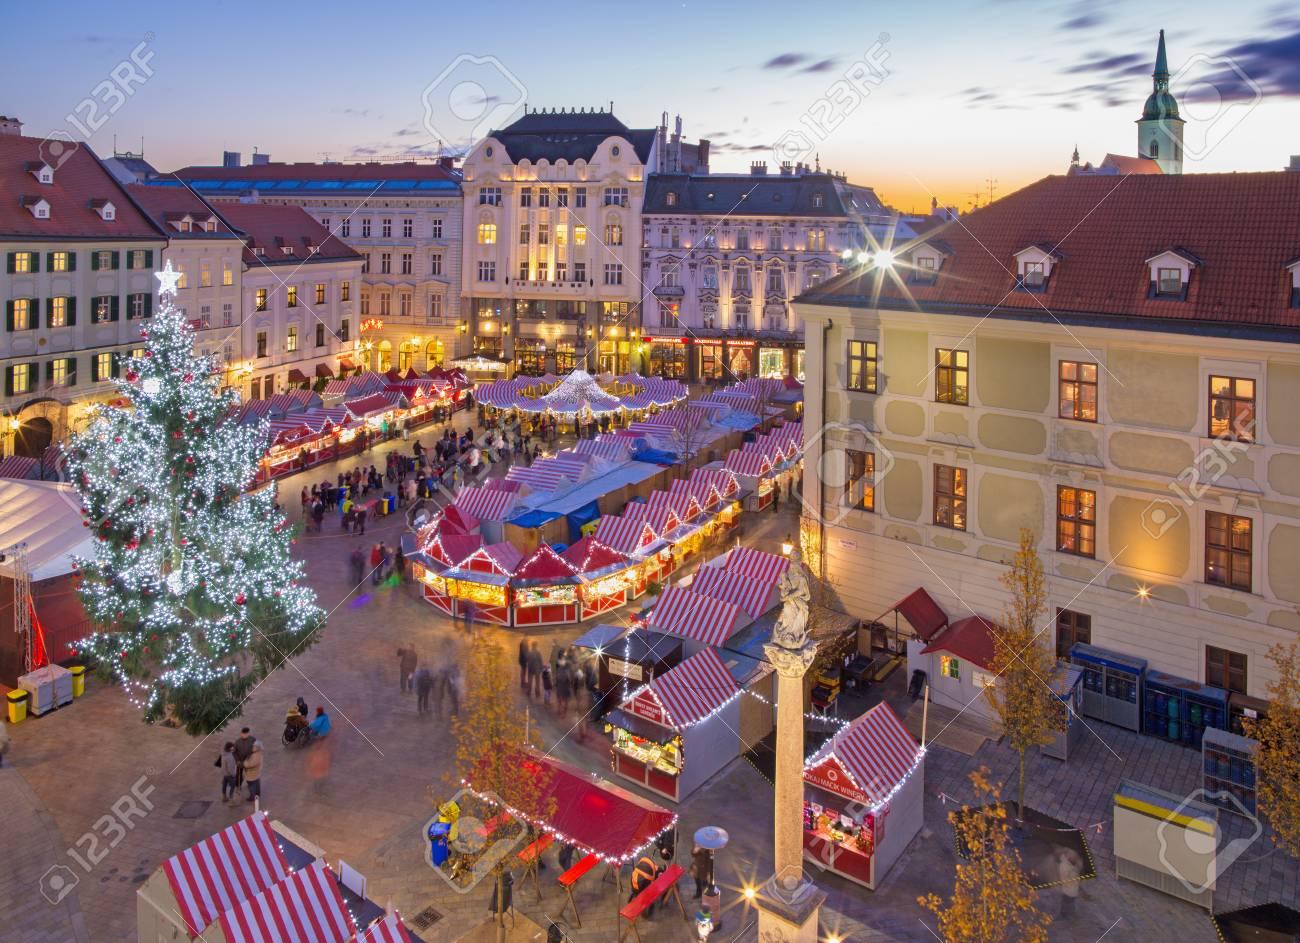 Christmas Bratislava.Bratislava Slovakia November 28 2016 Christmas Market On